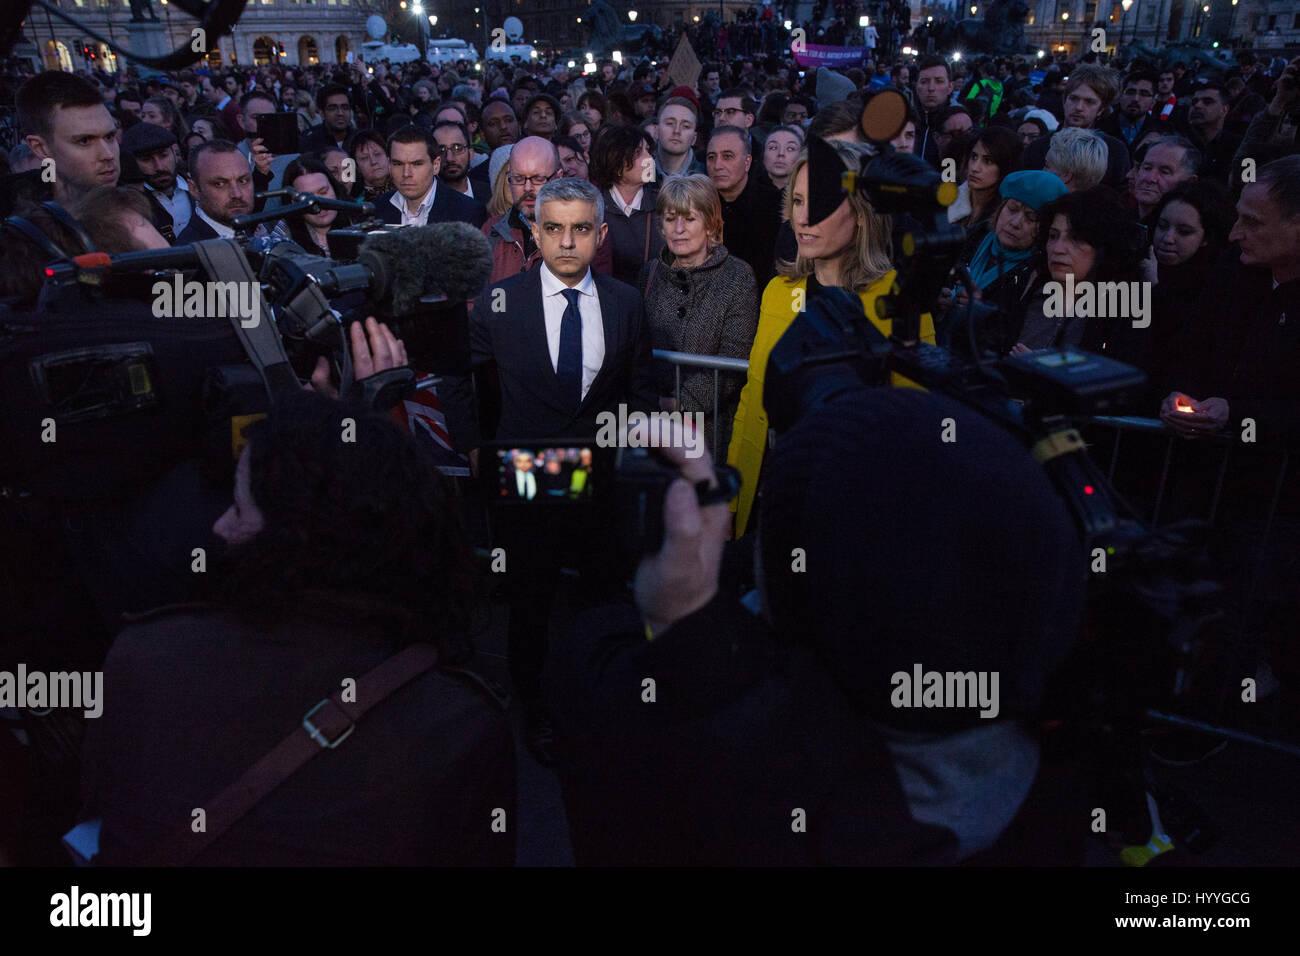 London, UK. 23rd March, 2017. Sadiq Khan, Mayor of London, is interviewed following a vigil in Trafalgar Square - Stock Image